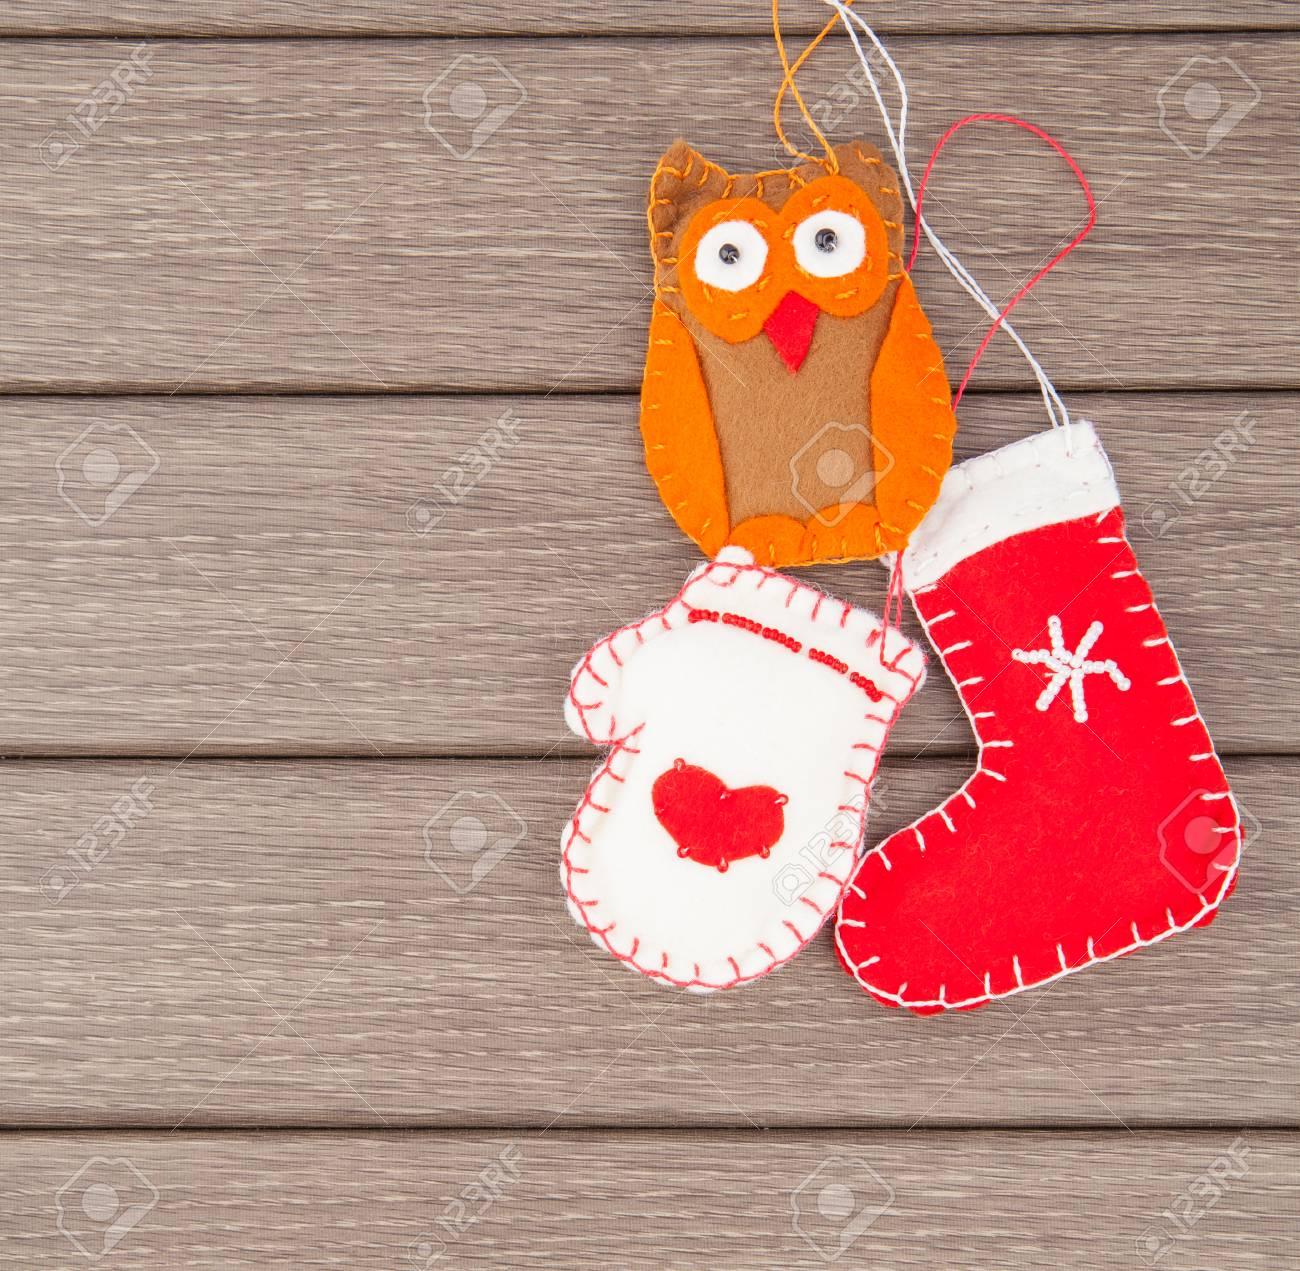 Christmas Handmade Felt Toys On Wooden Holiday Decoration